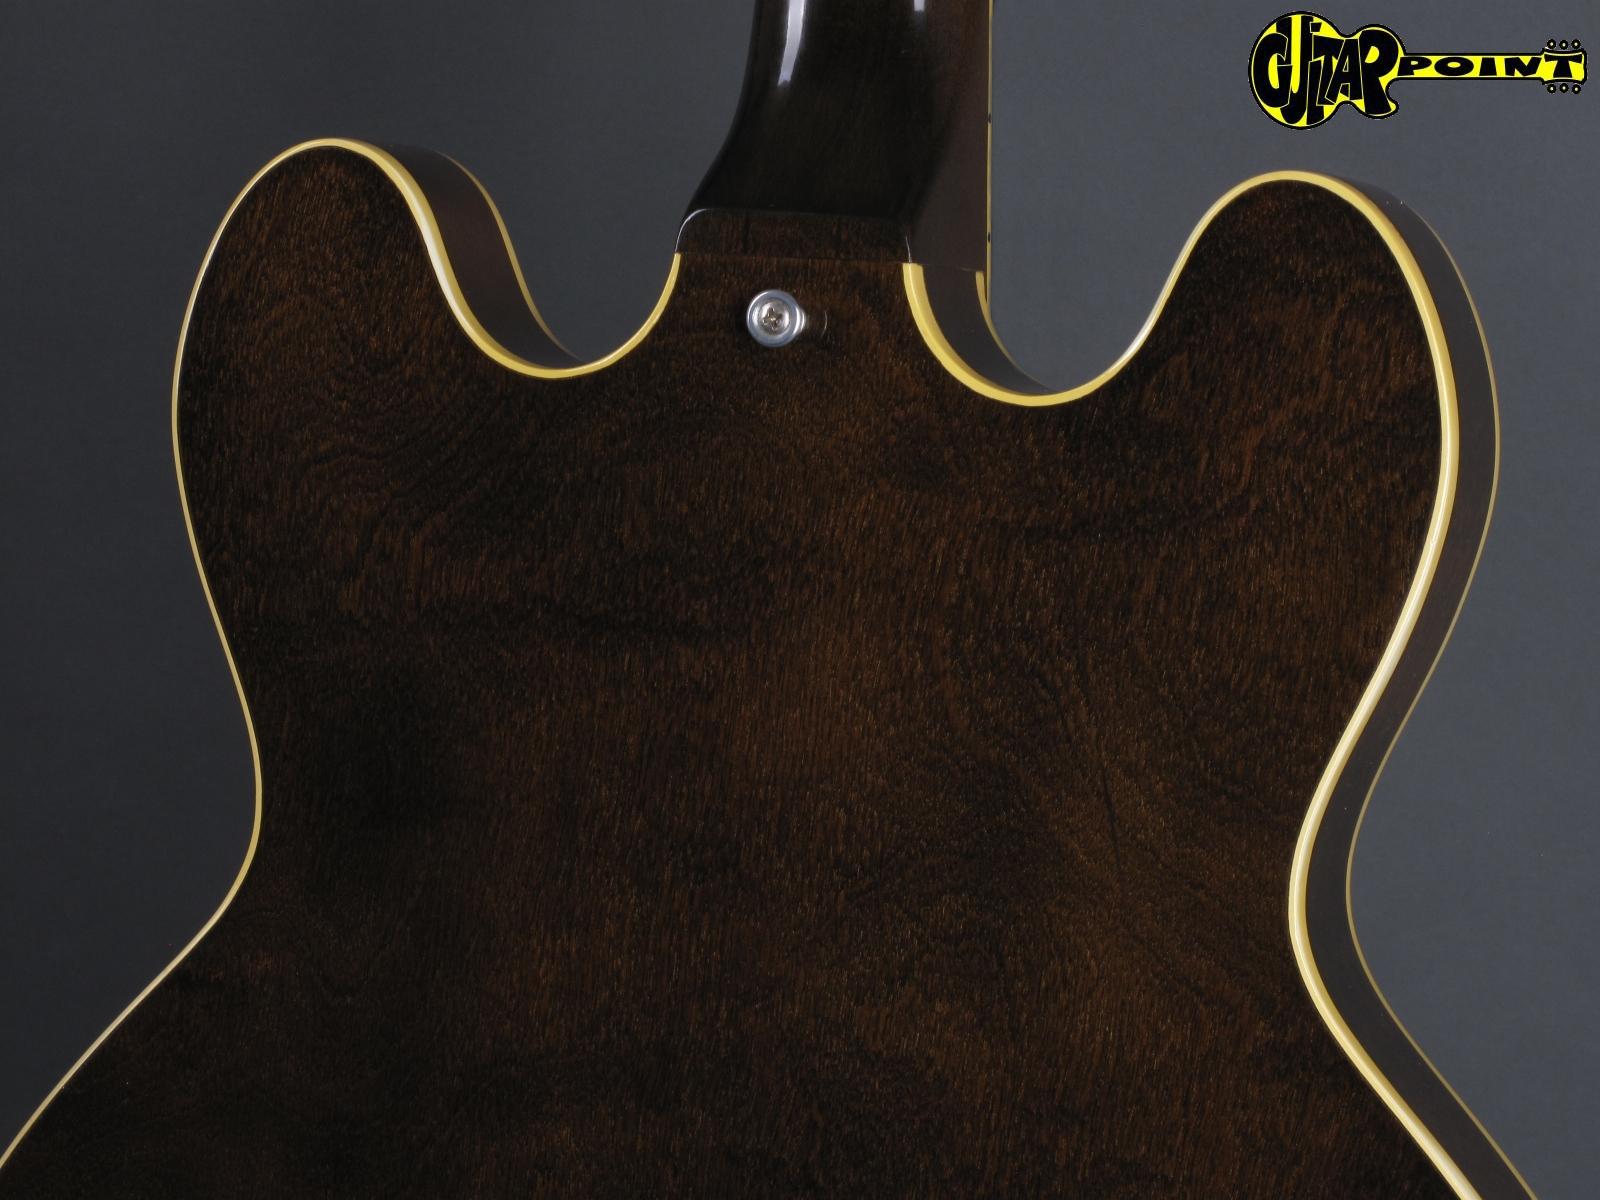 1971 Gibson Es 340 Tdw Walnut Vi71gies340tdw963833 5 Wiring Diagram